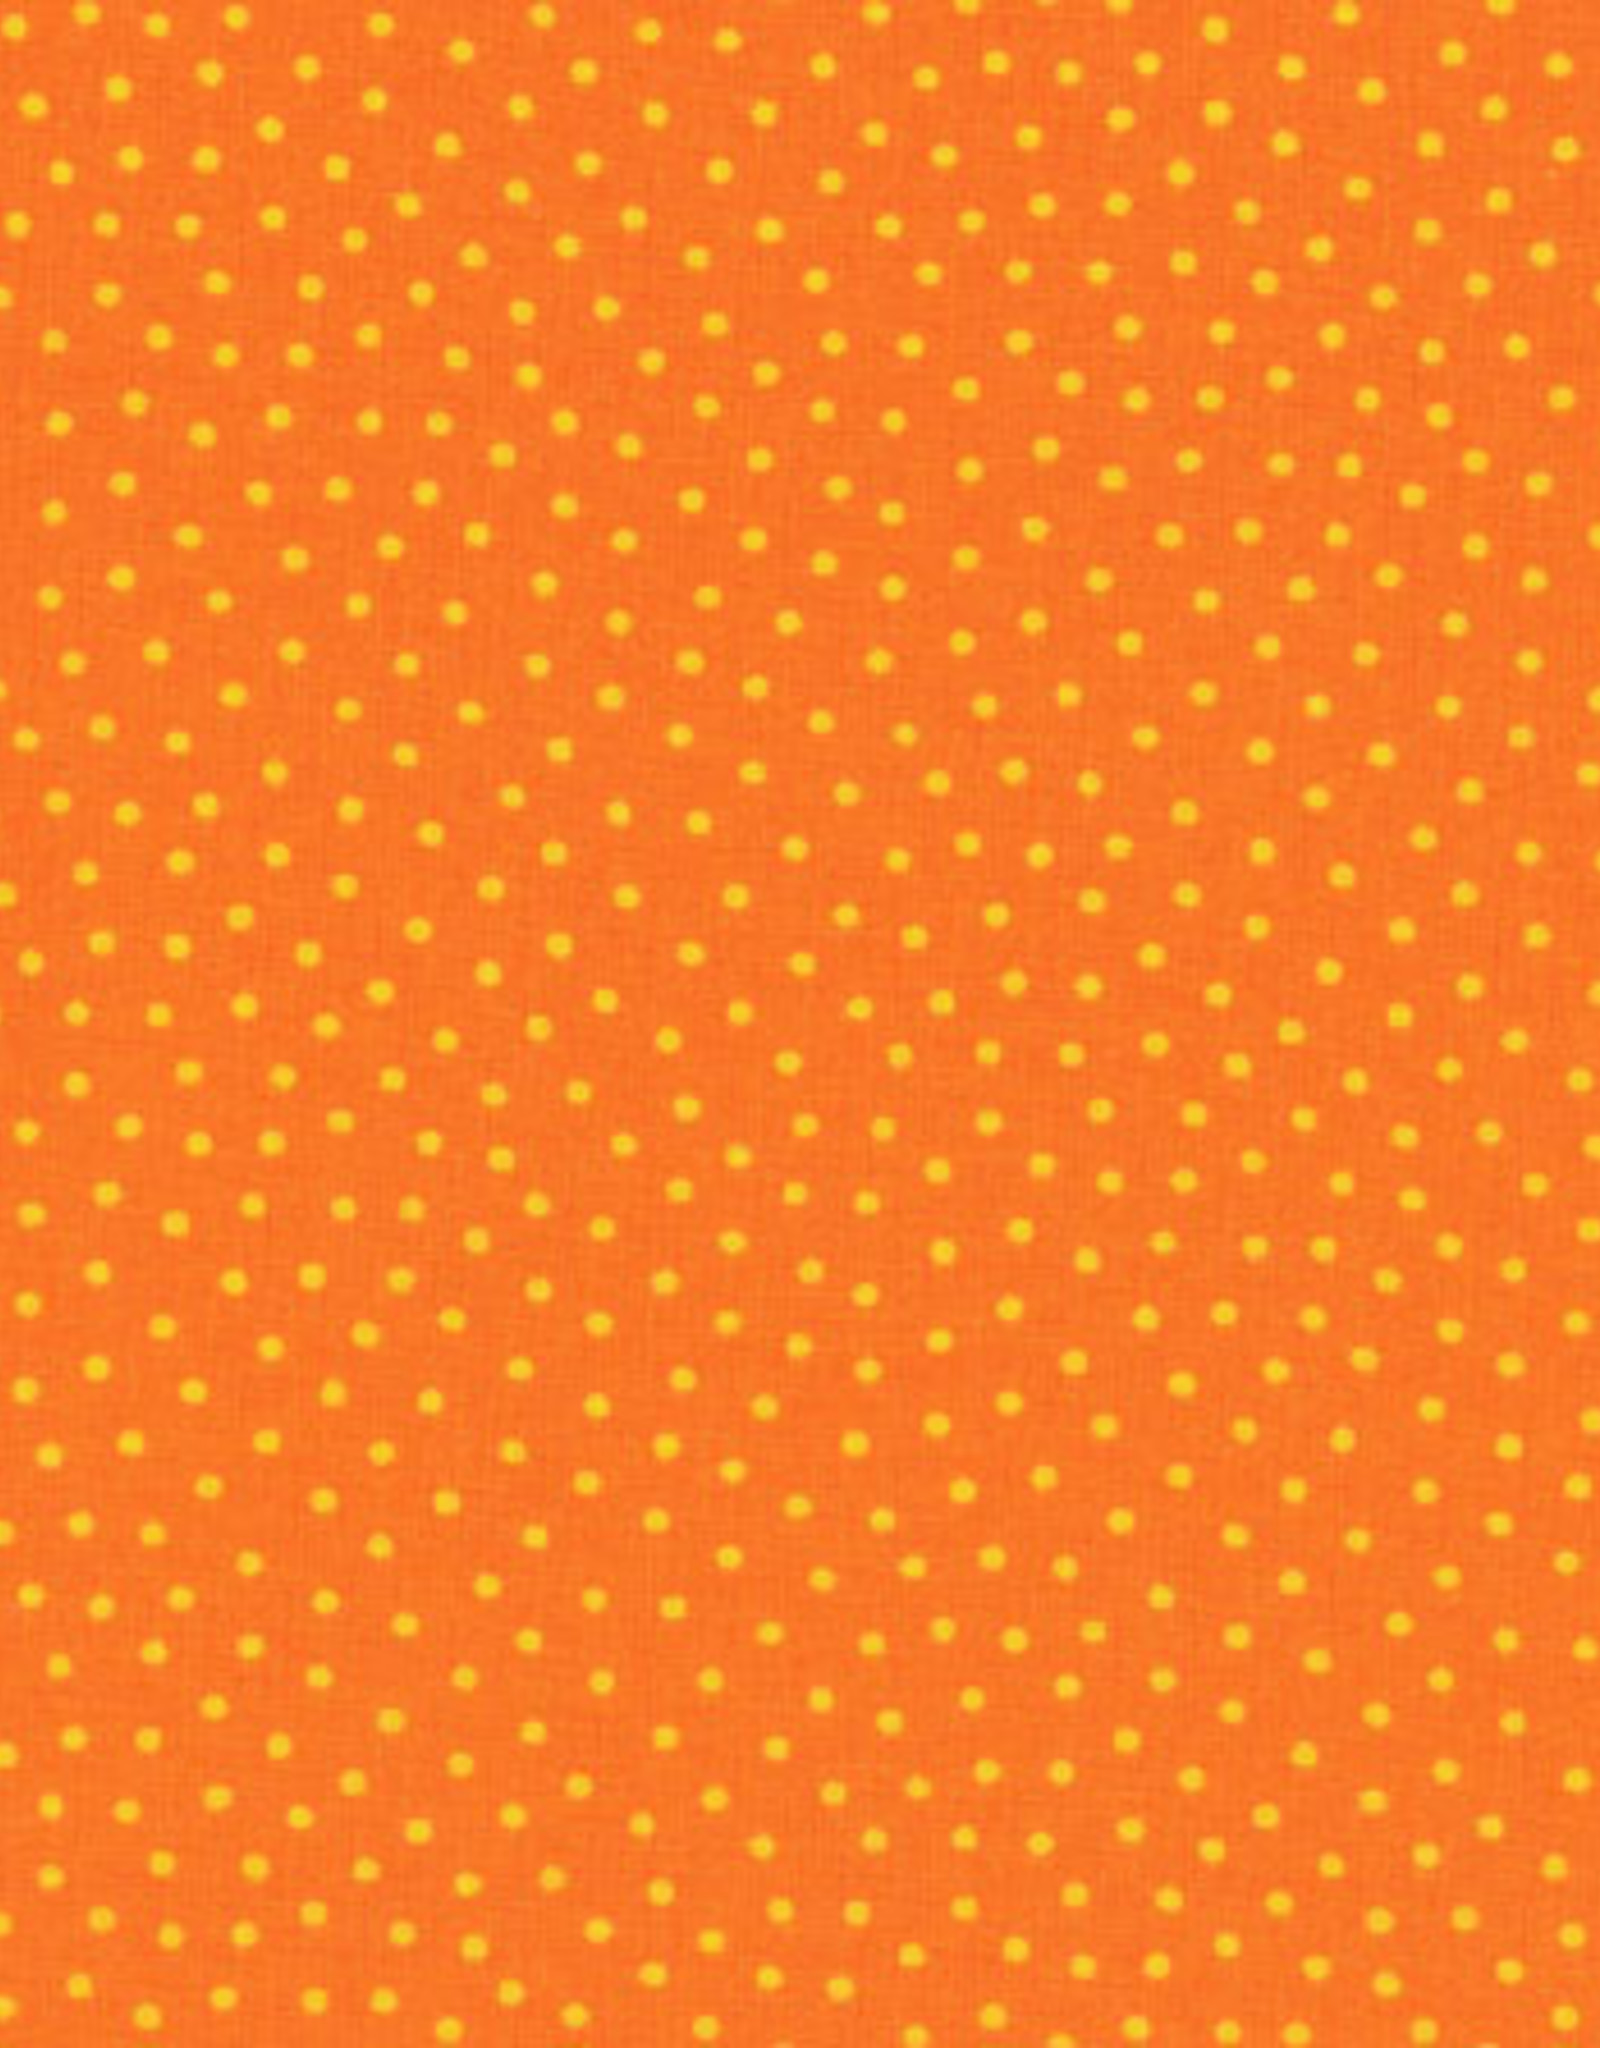 Westfalenstoffe AG 10 cm Junge Linie  010505828 orange-gelb